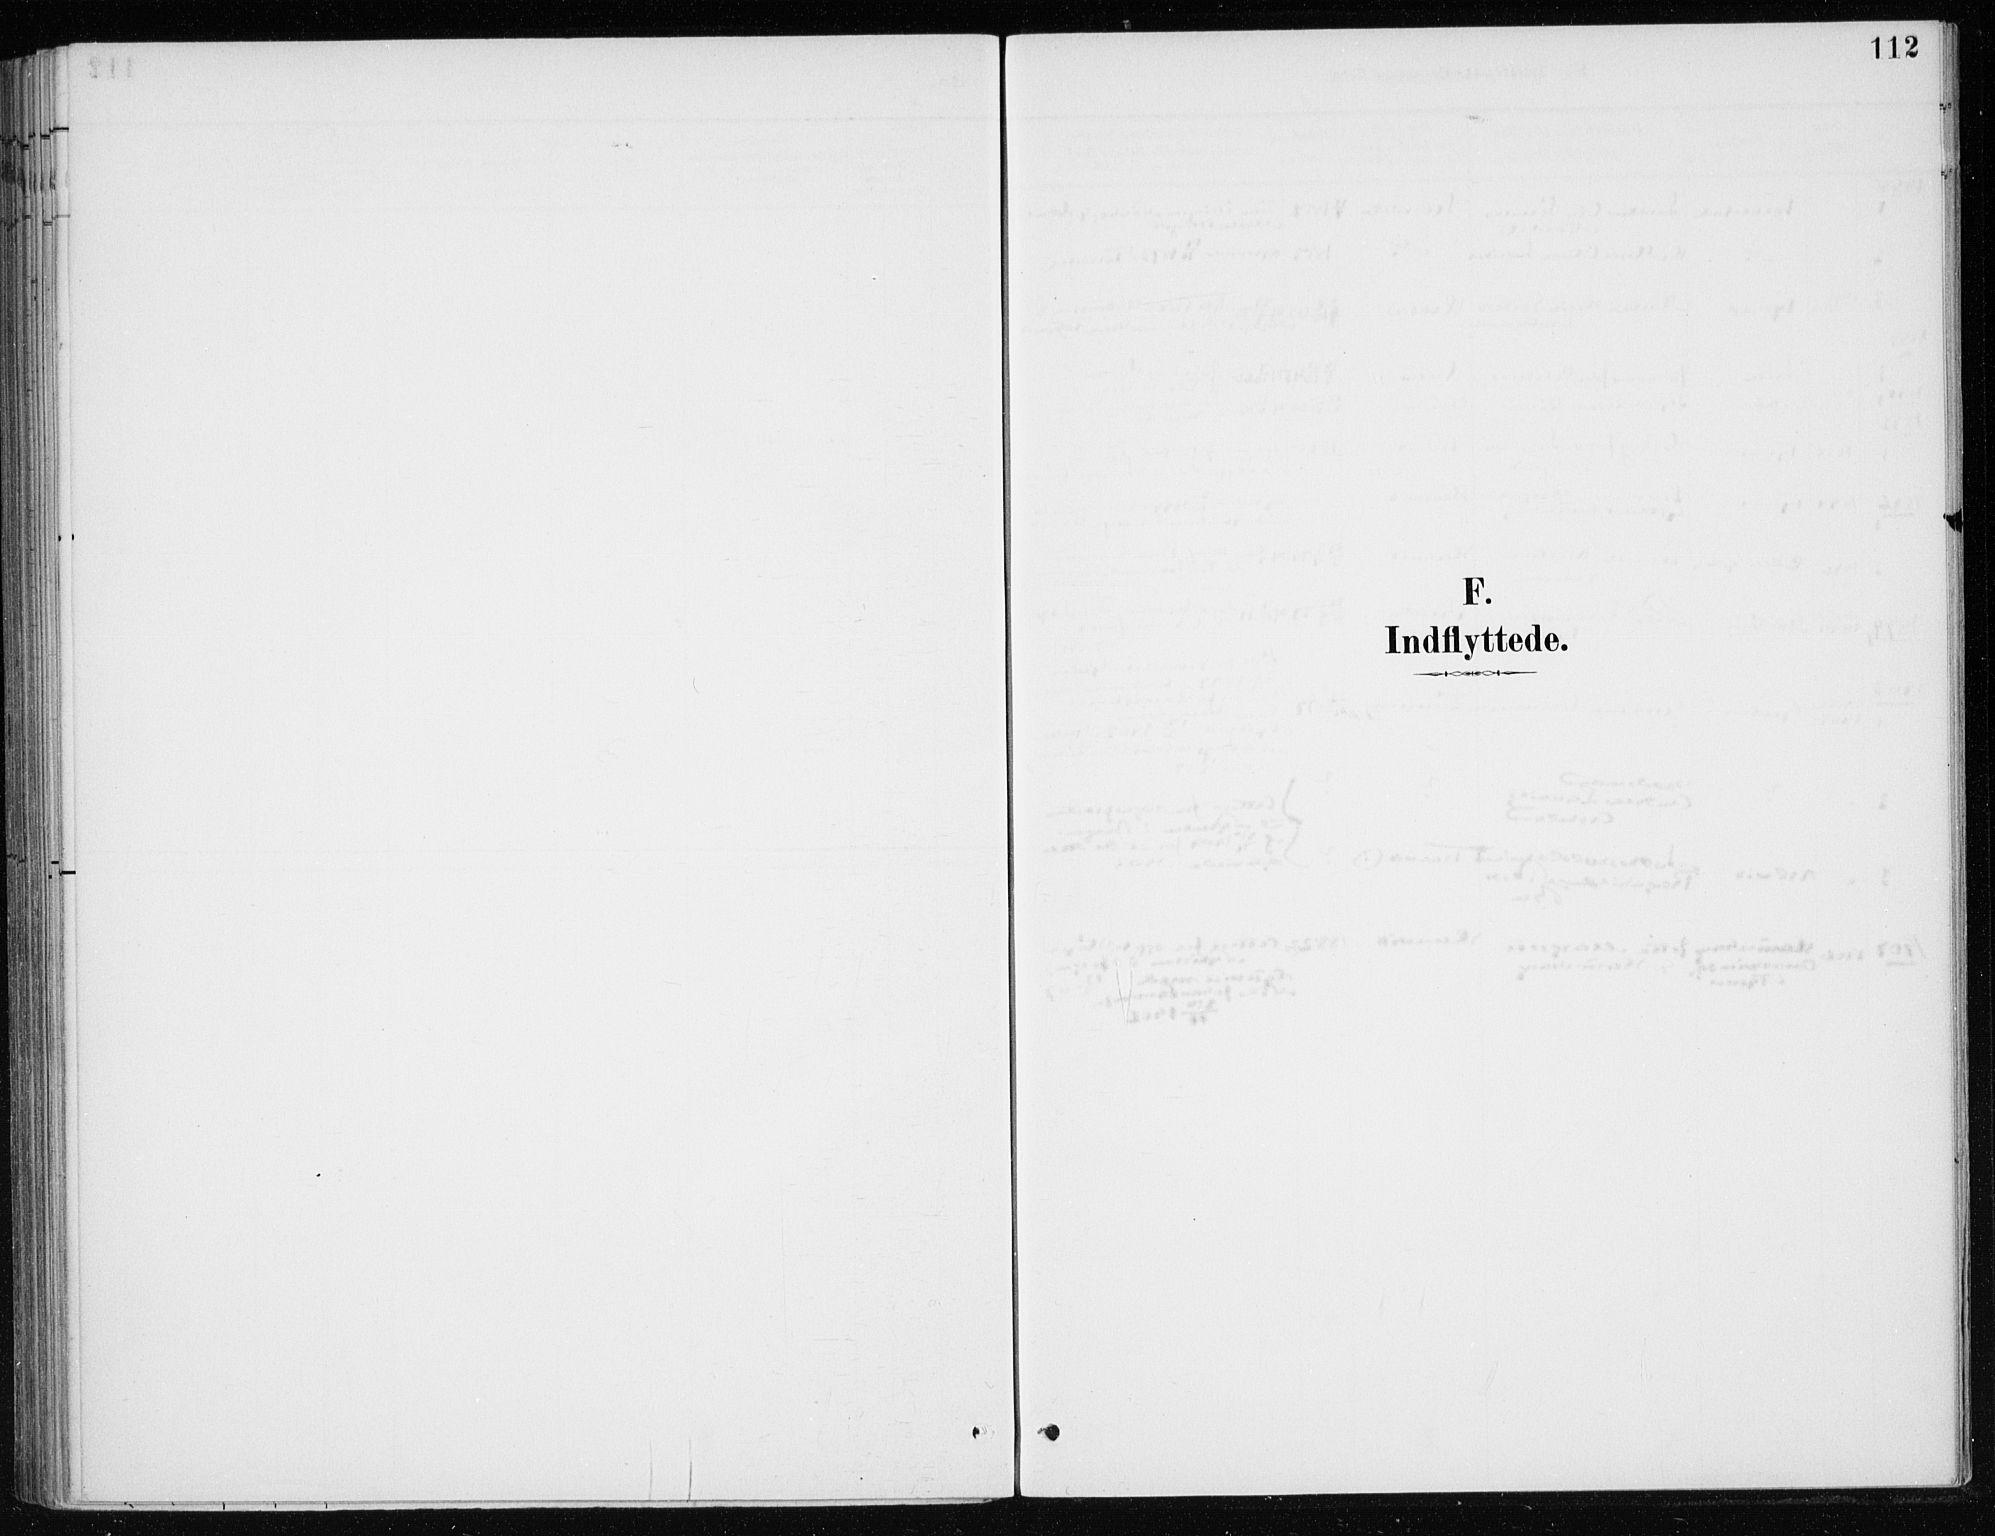 SAB, Kvinnherad Sokneprestembete, H/Haa: Ministerialbok nr. E 1, 1887-1912, s. 112